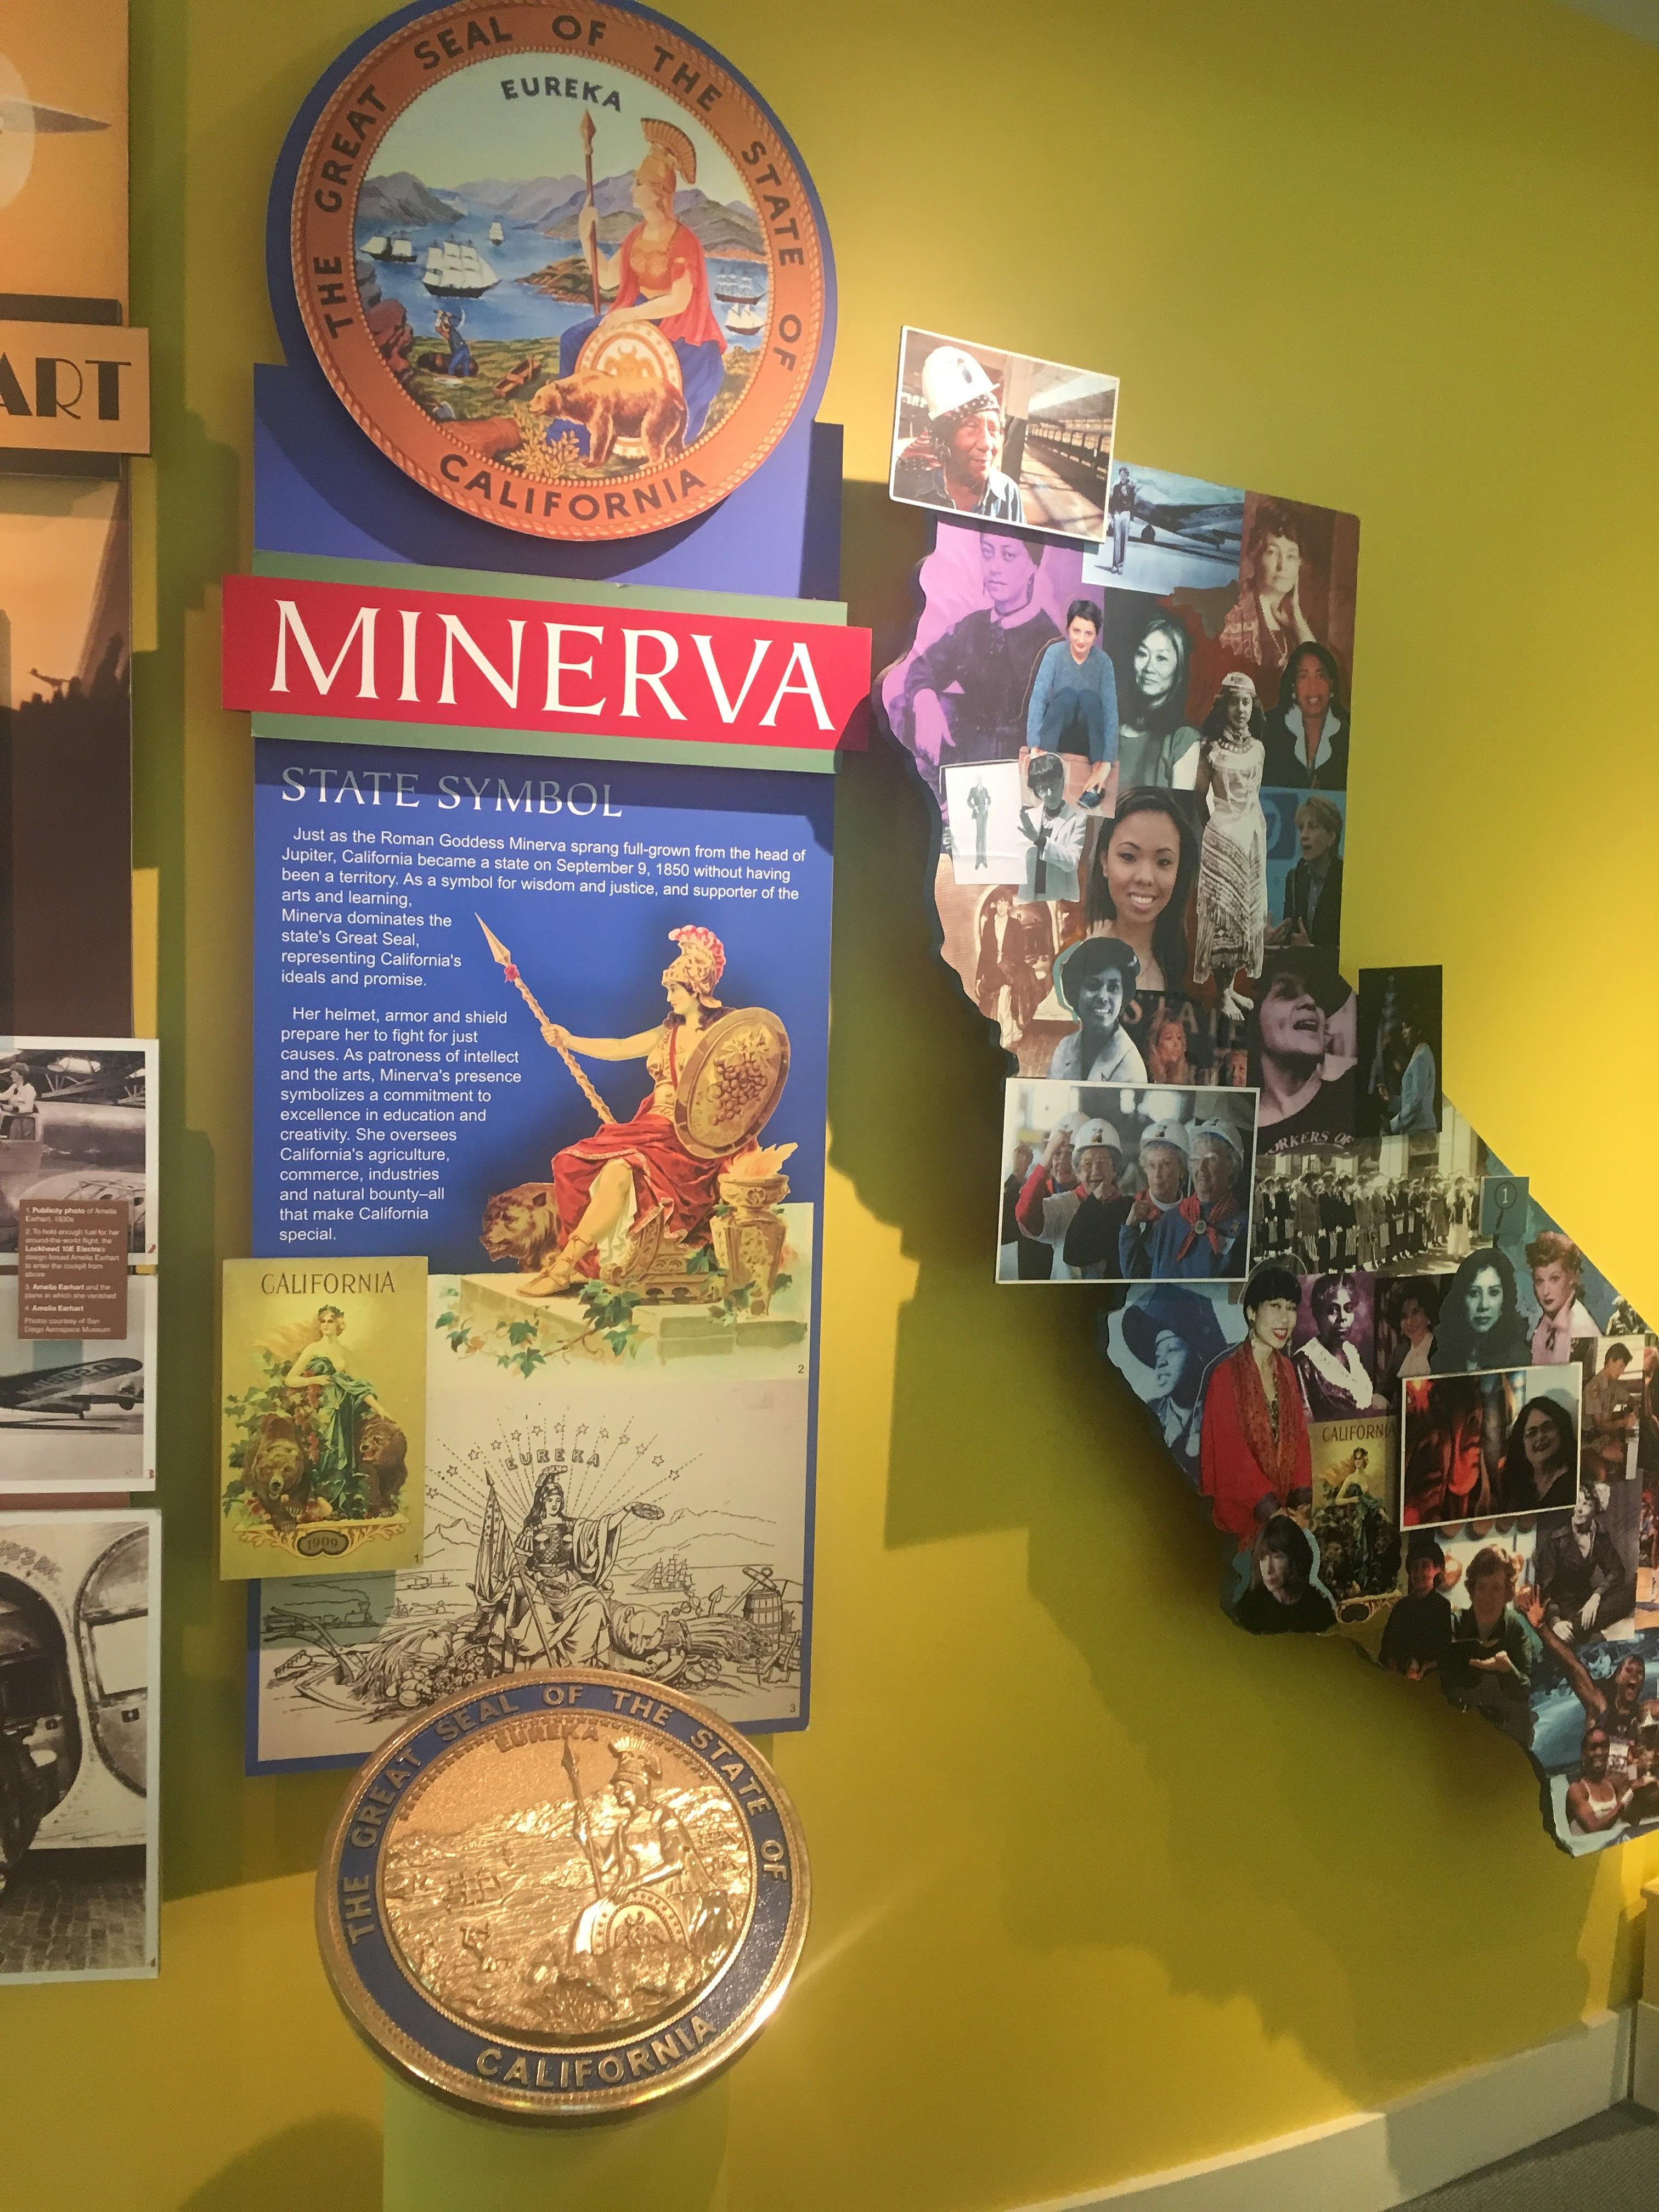 Filethe Ca Museum State Symbols Minerva Exhibitg Wikimedia Commons